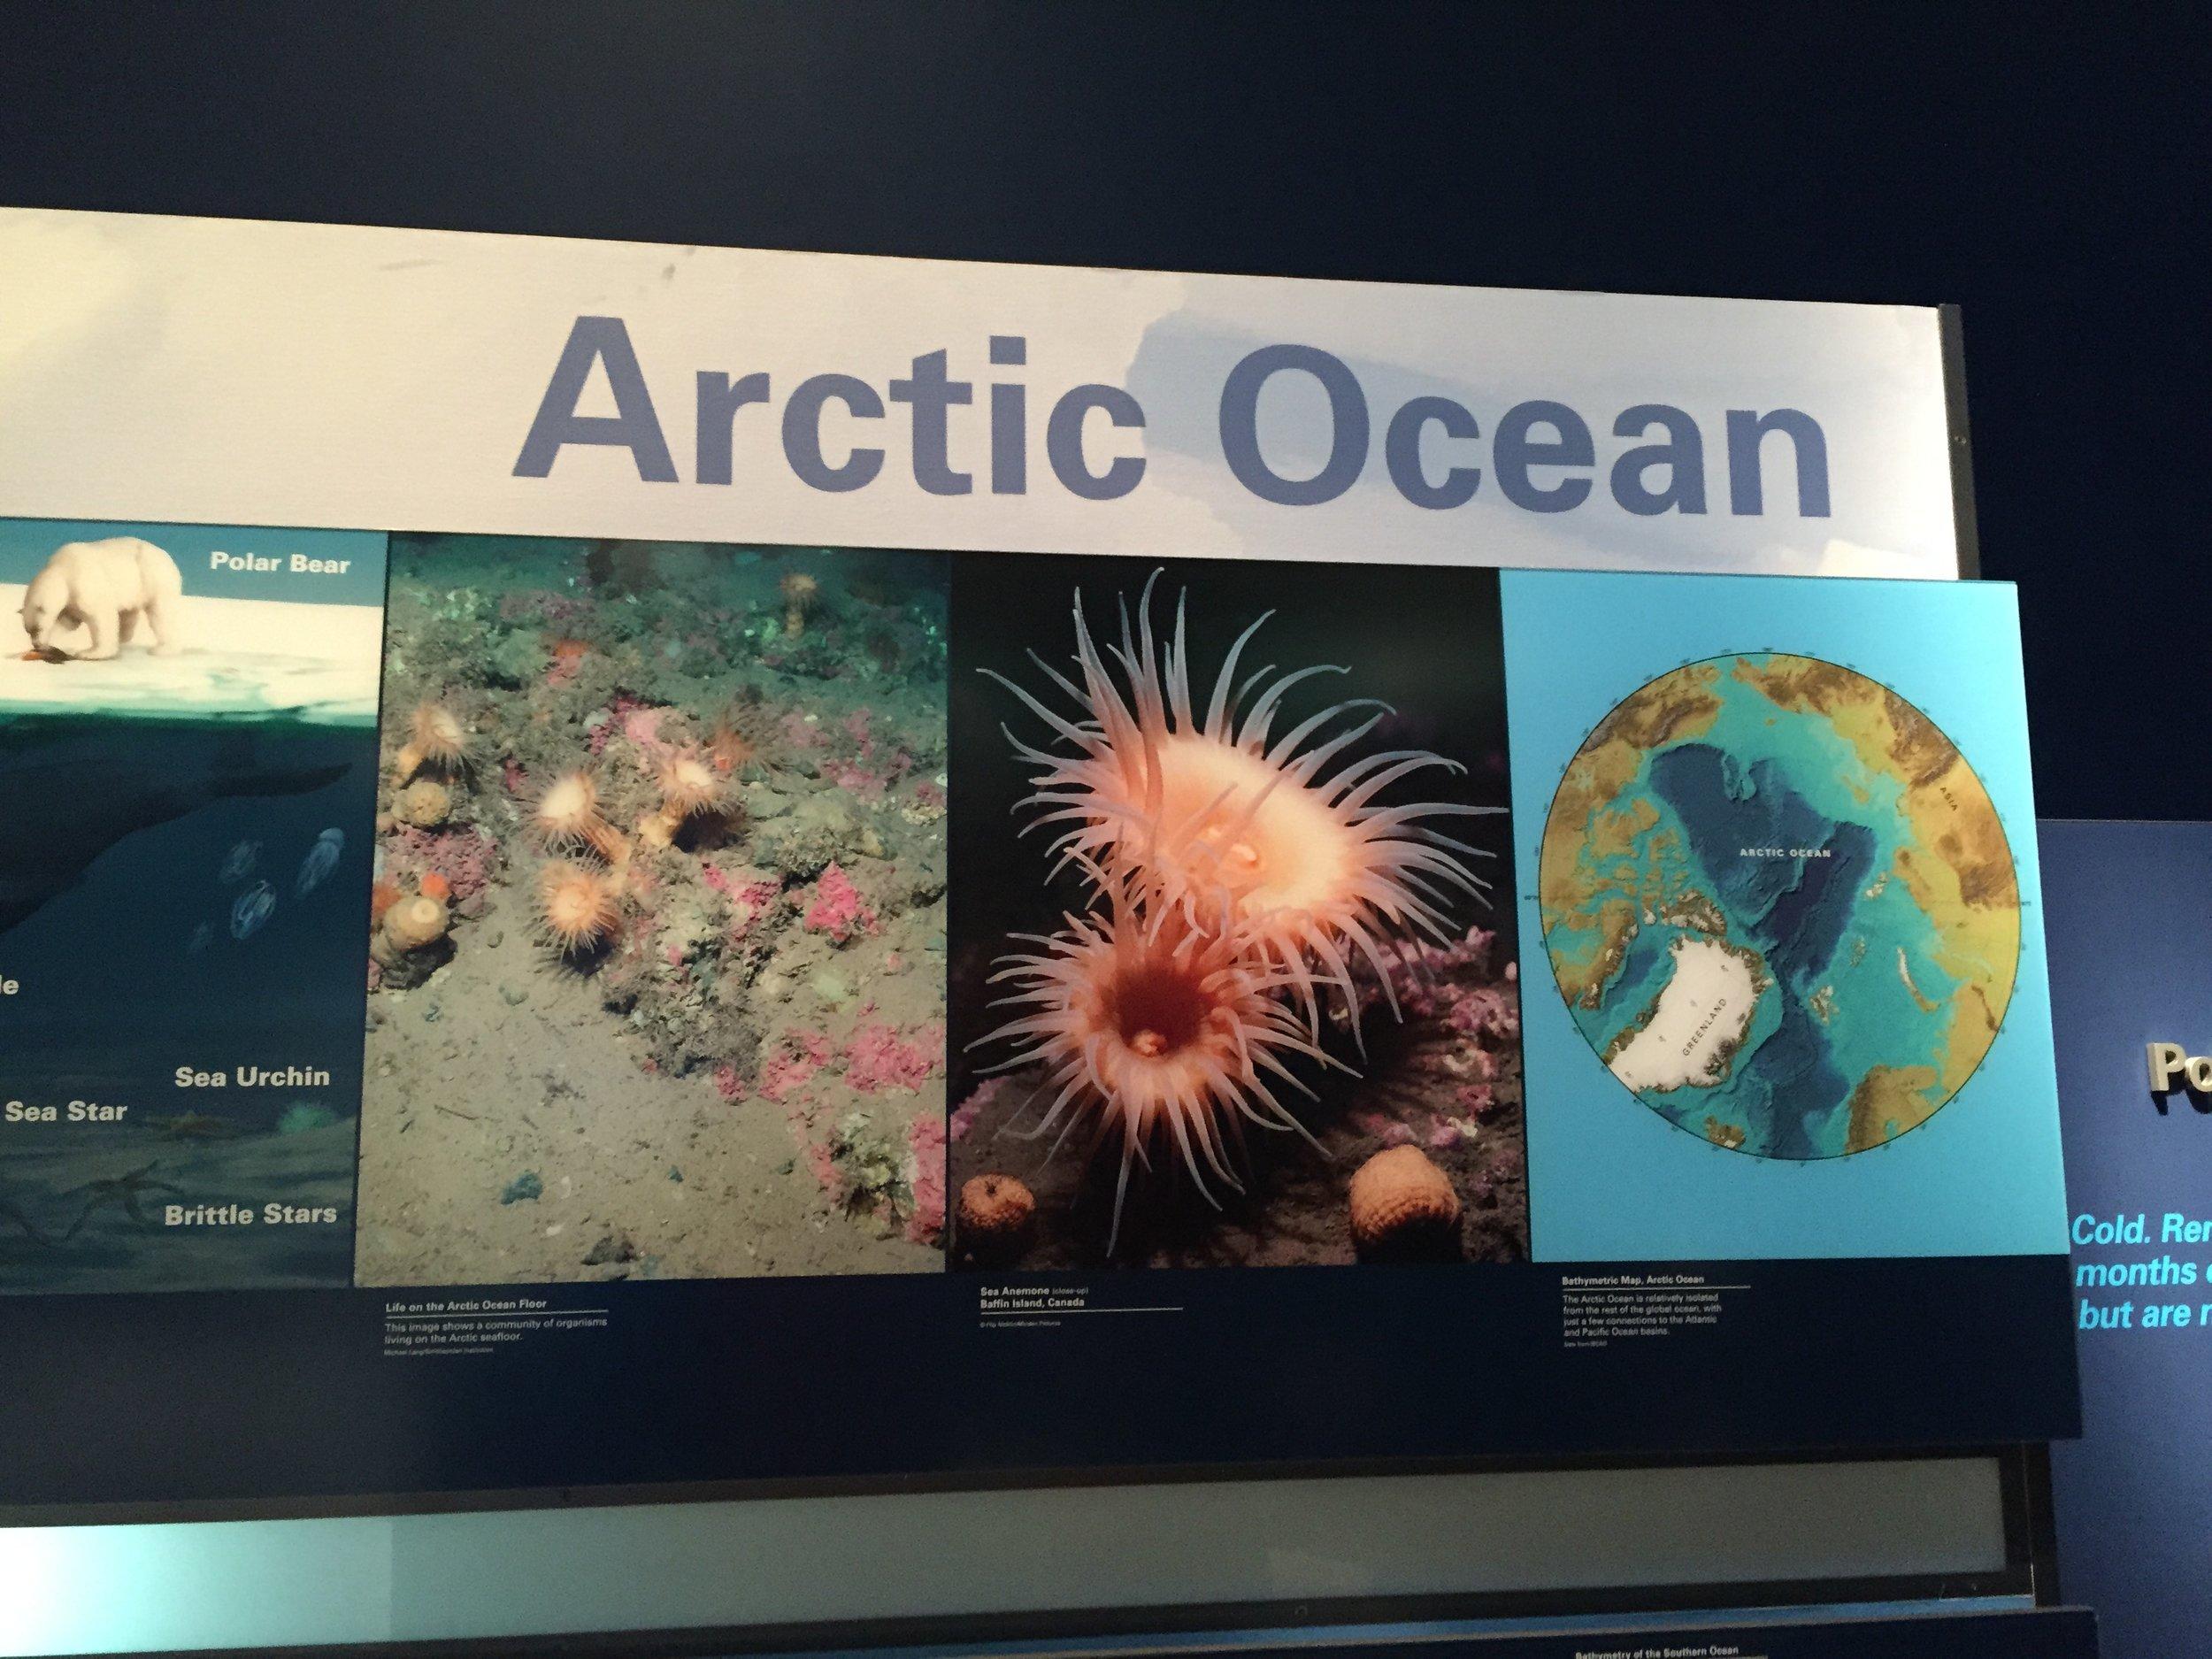 Arcticfestival_Image3.jpg